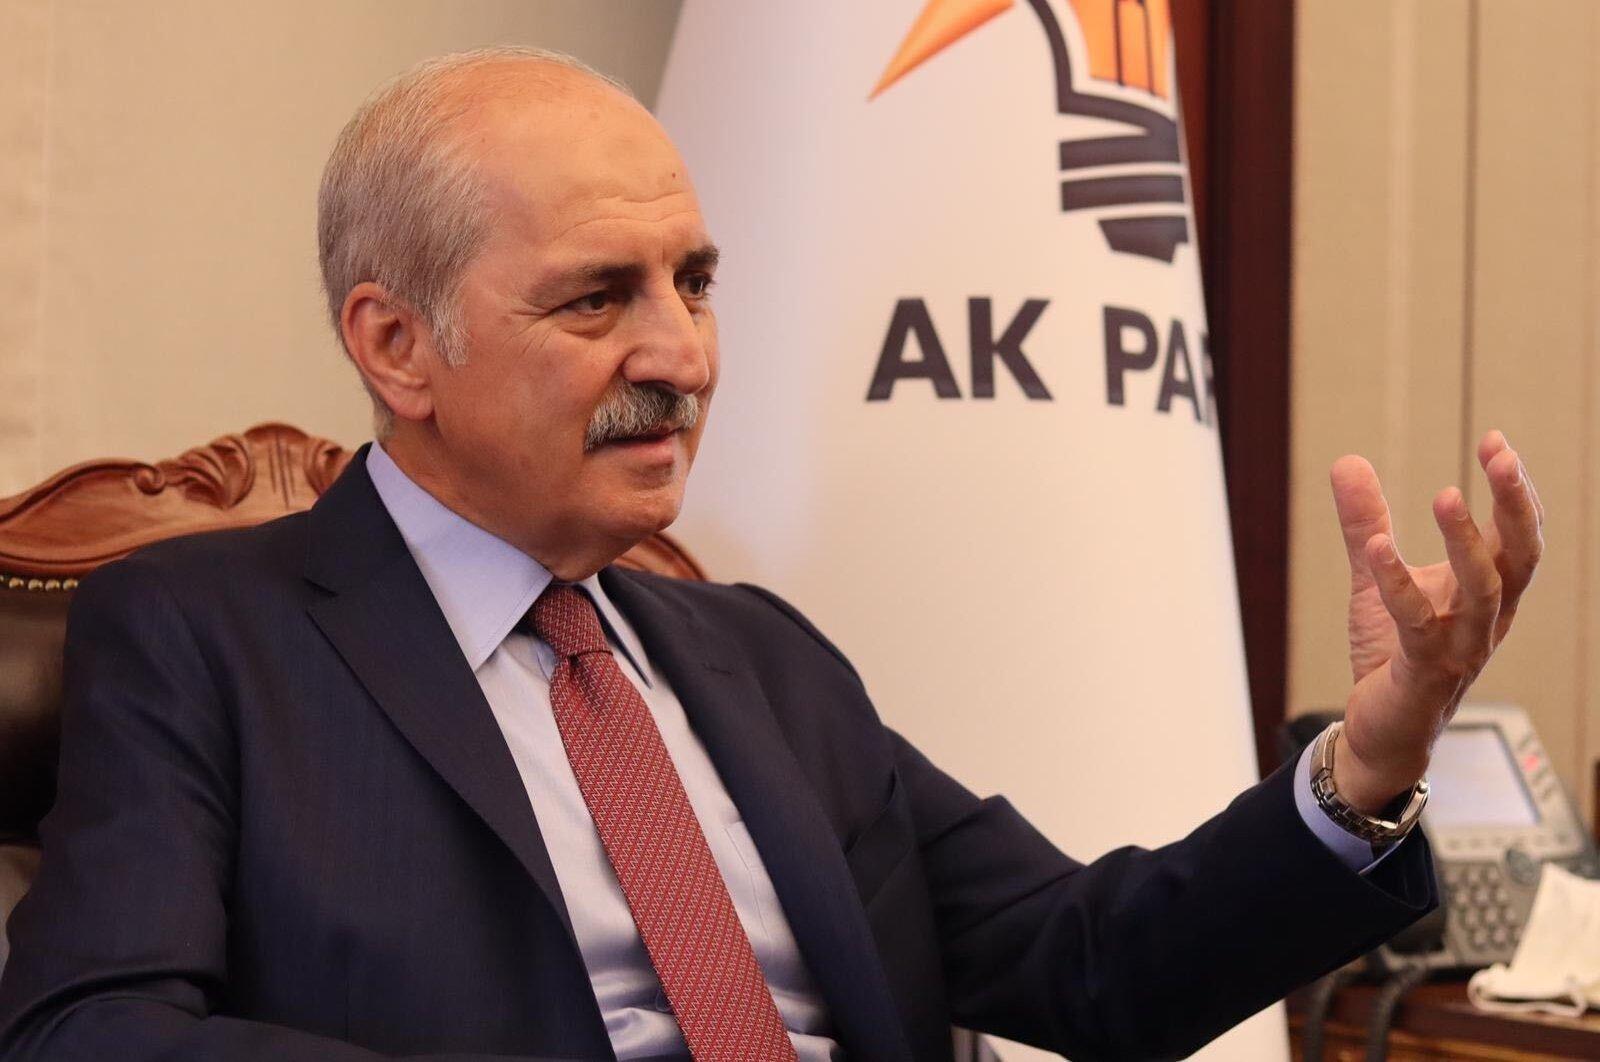 AK Party deputy chairman Numan Kurtulmuş speaks to Daily Sabah's Nur Özkan Erbay at the AK Party Headquarters in Ankara, September 2, 2020 (DS Photo)